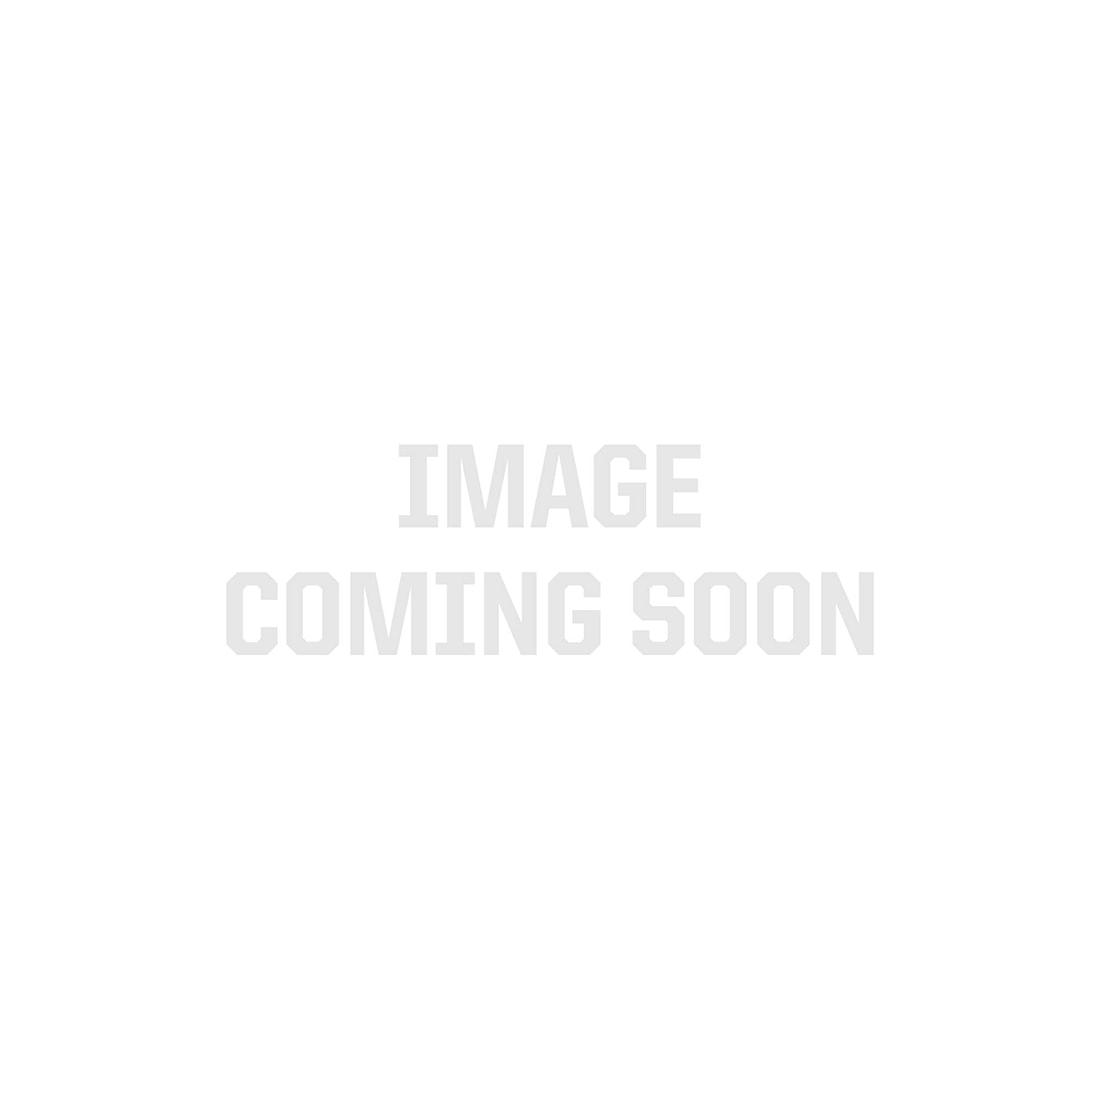 Stick CW4 Sunlite Touch Sensitive Intelligent Control Keypad (Easy Stand Alone DMX Controller) (Black)